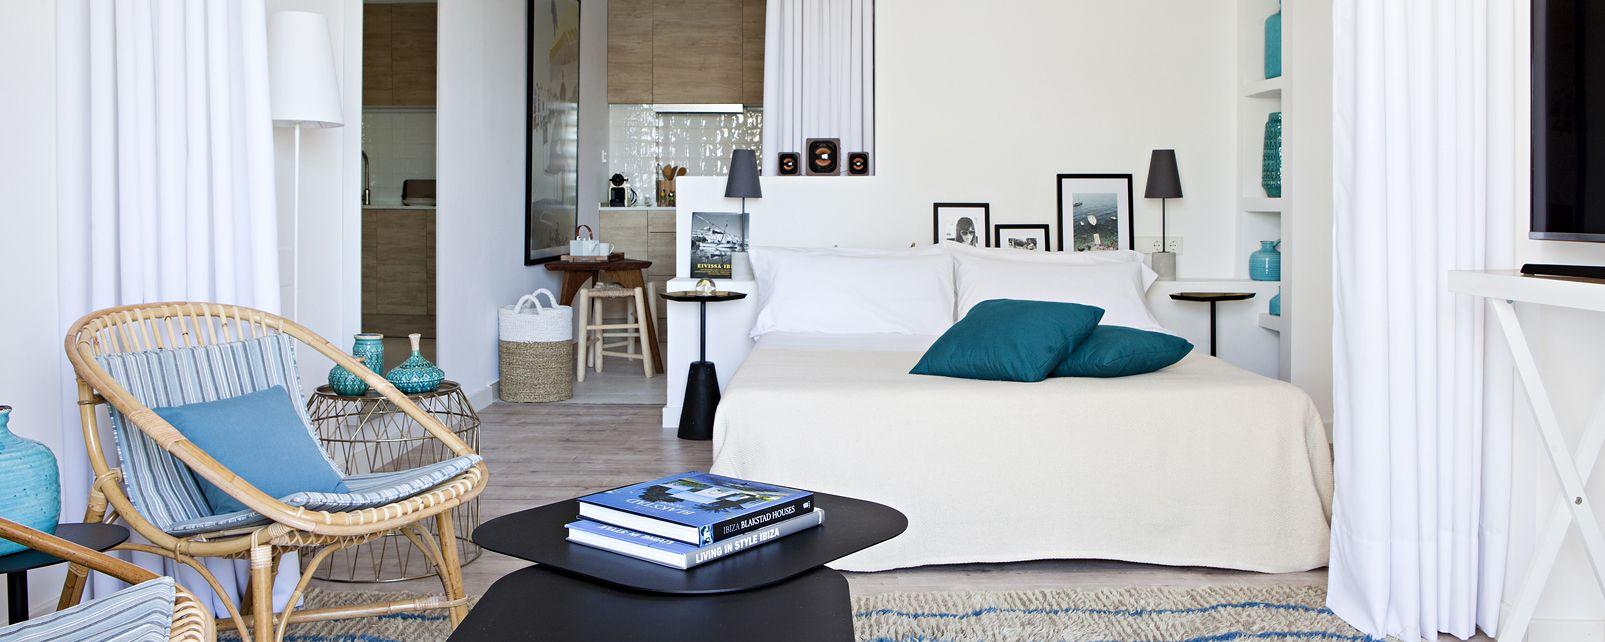 Hôtel 105 Suites Marina Magna